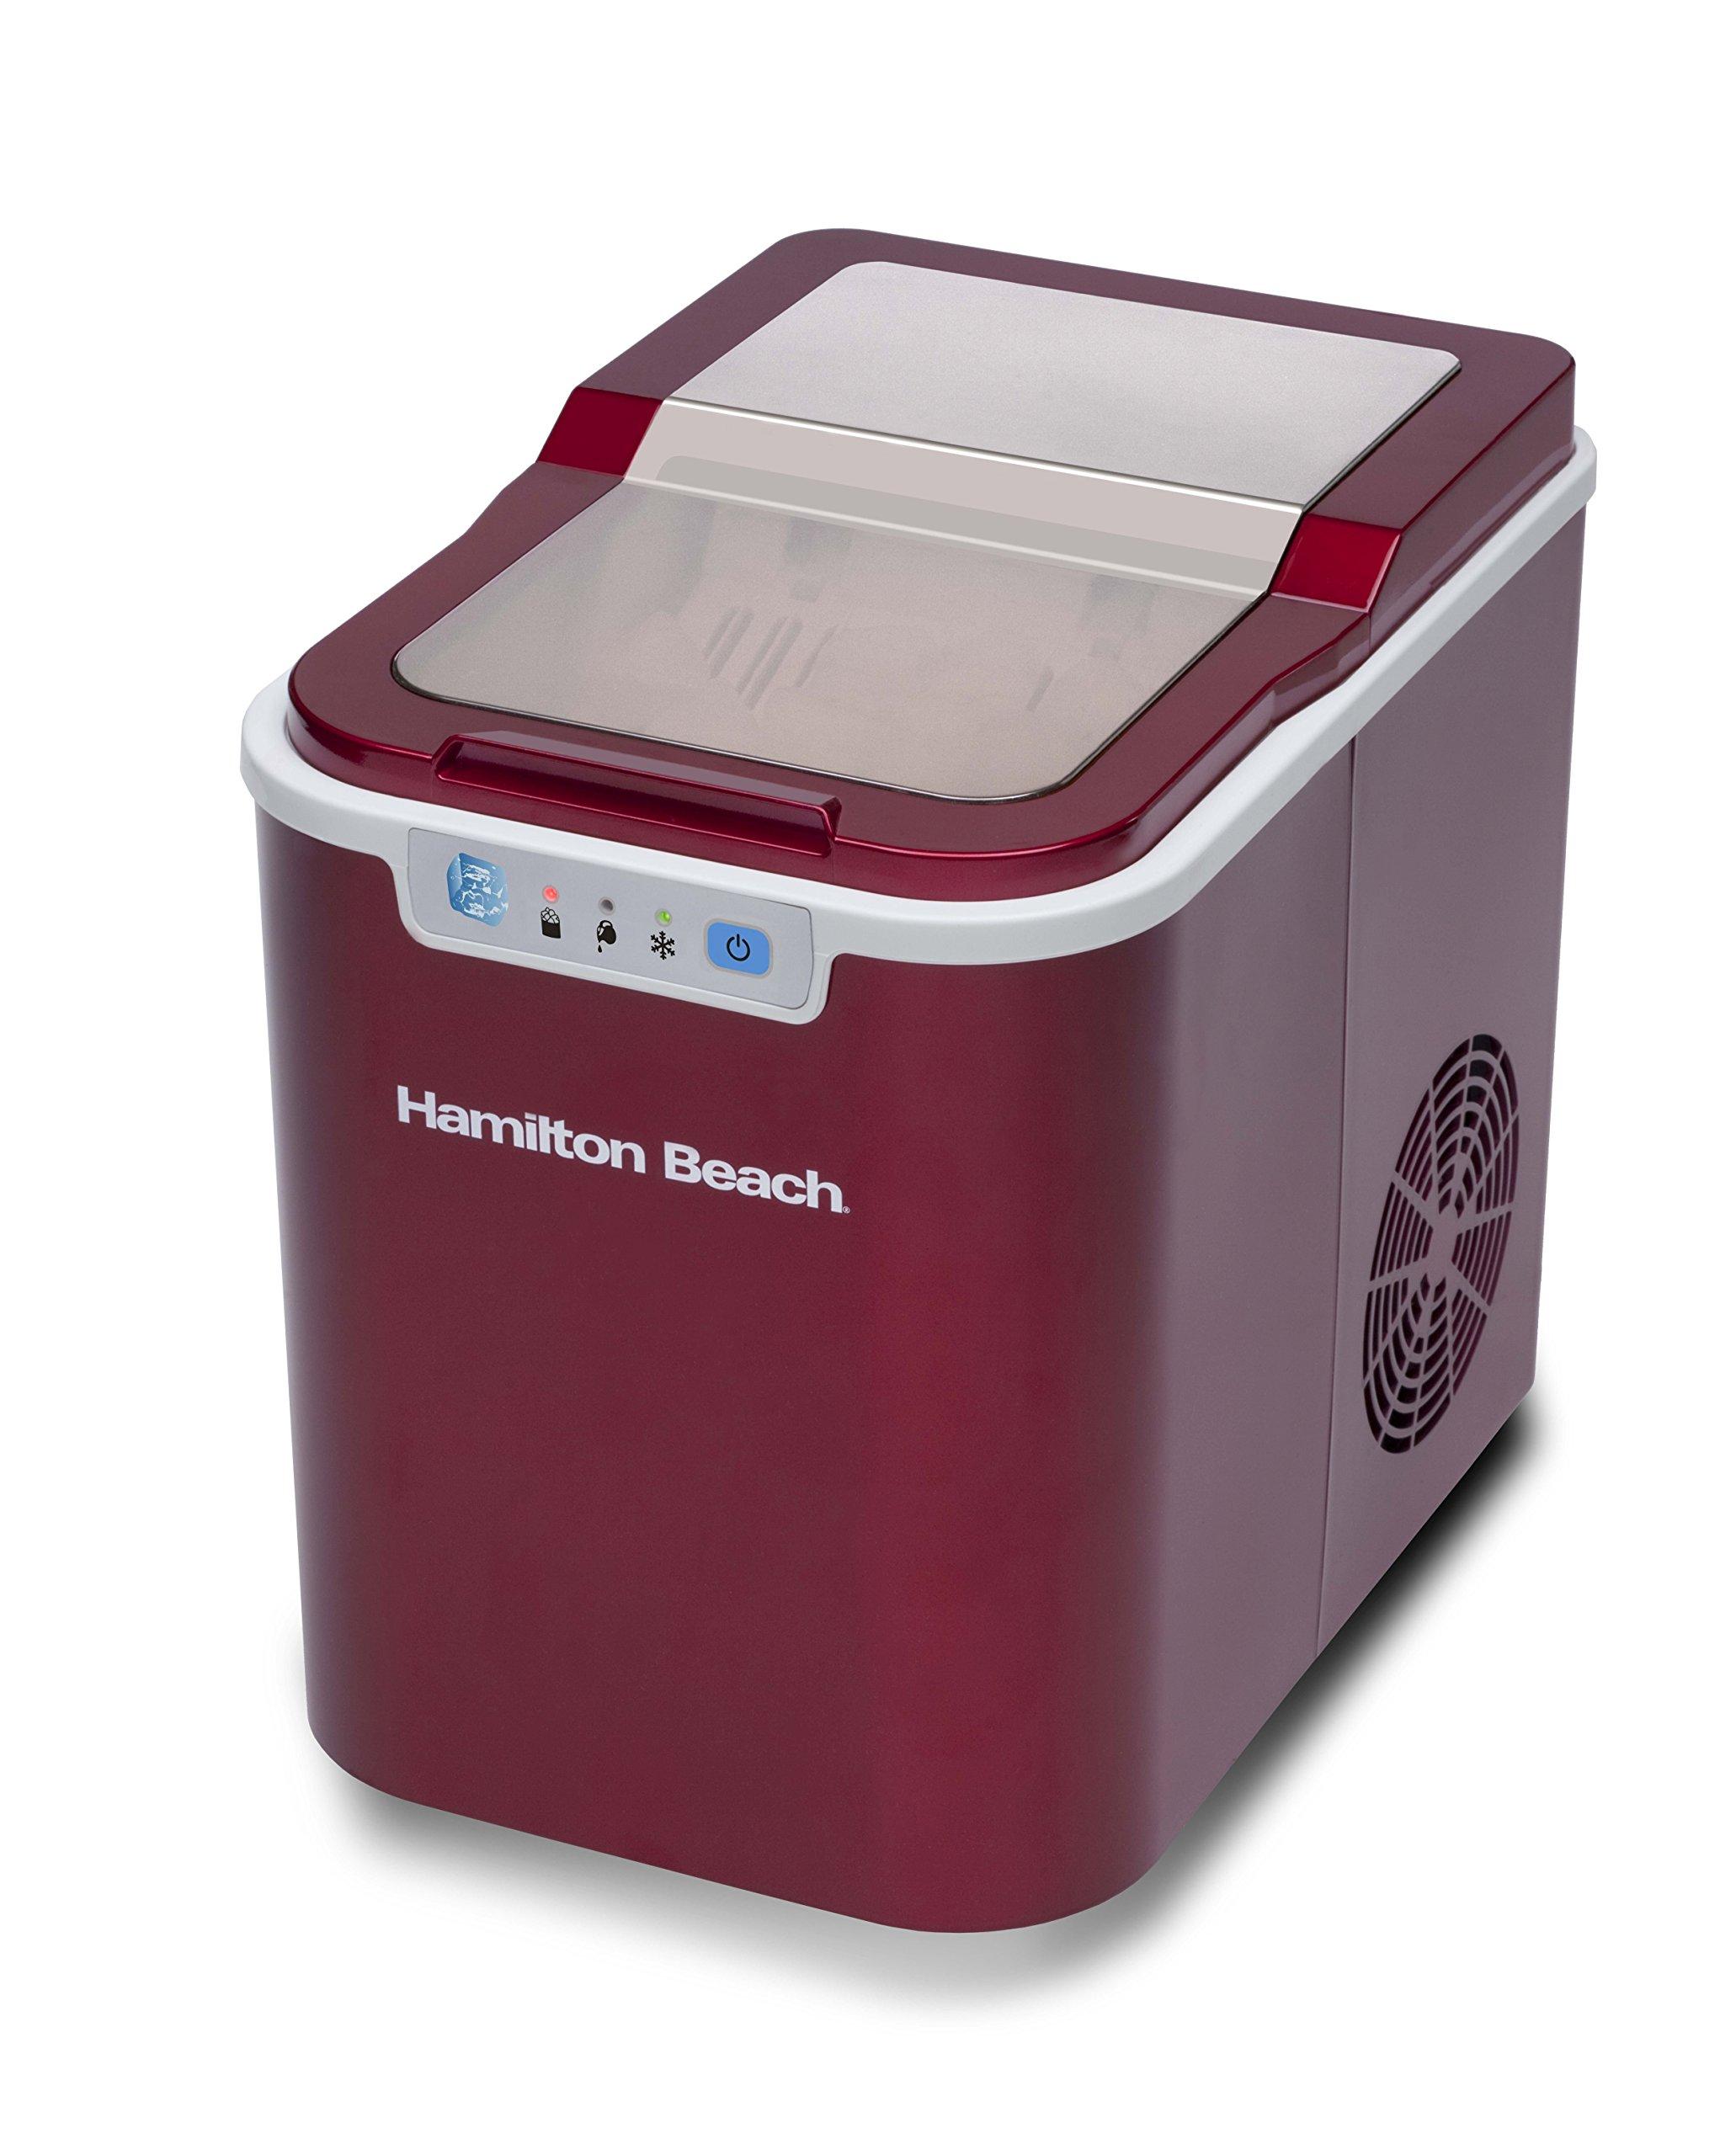 Hamilton Beach Portable Ice Maker, Candy Apple Red